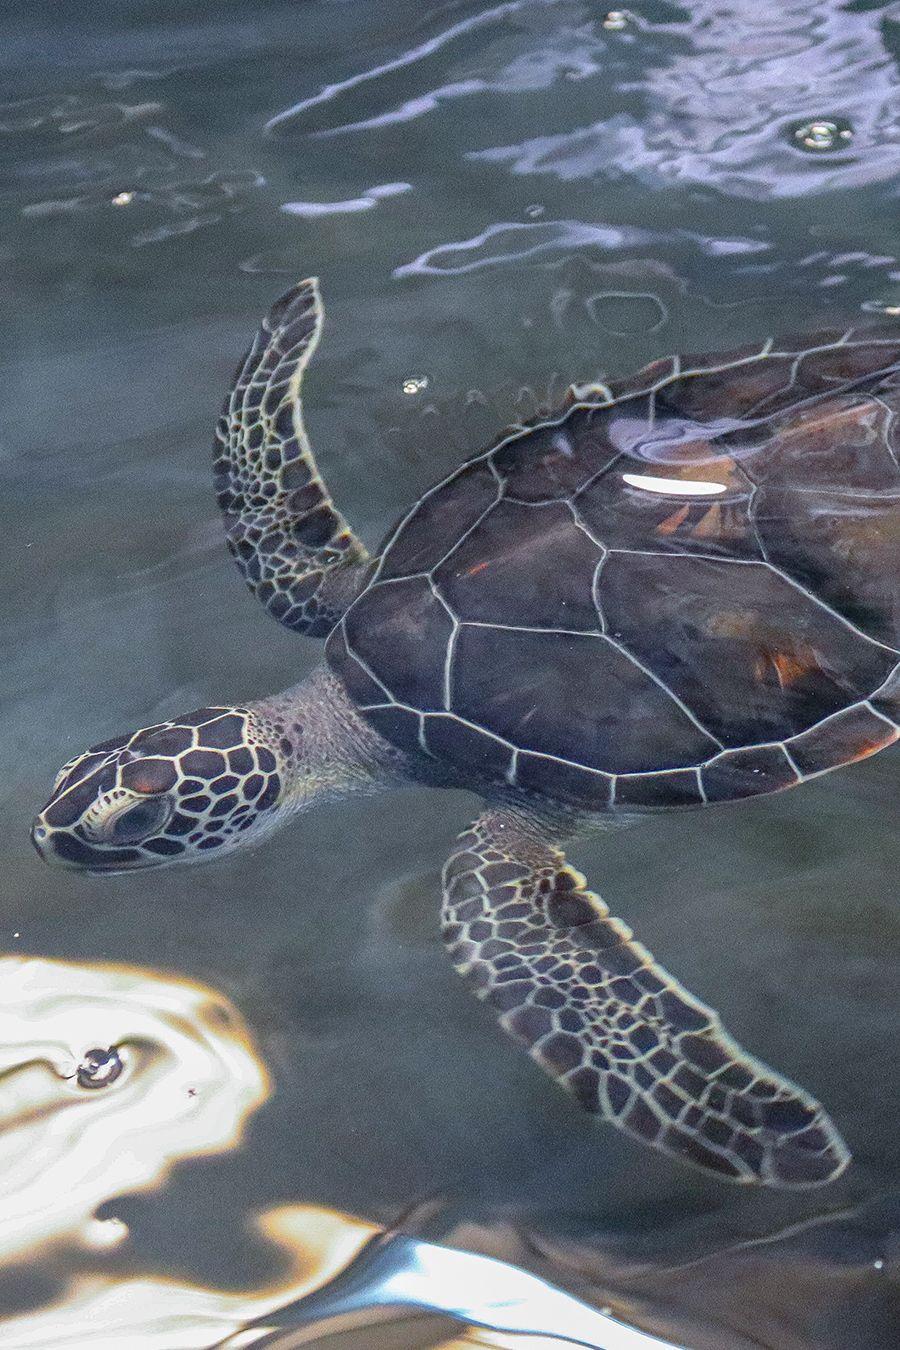 The Texas State Aquarium's Wildlife Rescue Center recently